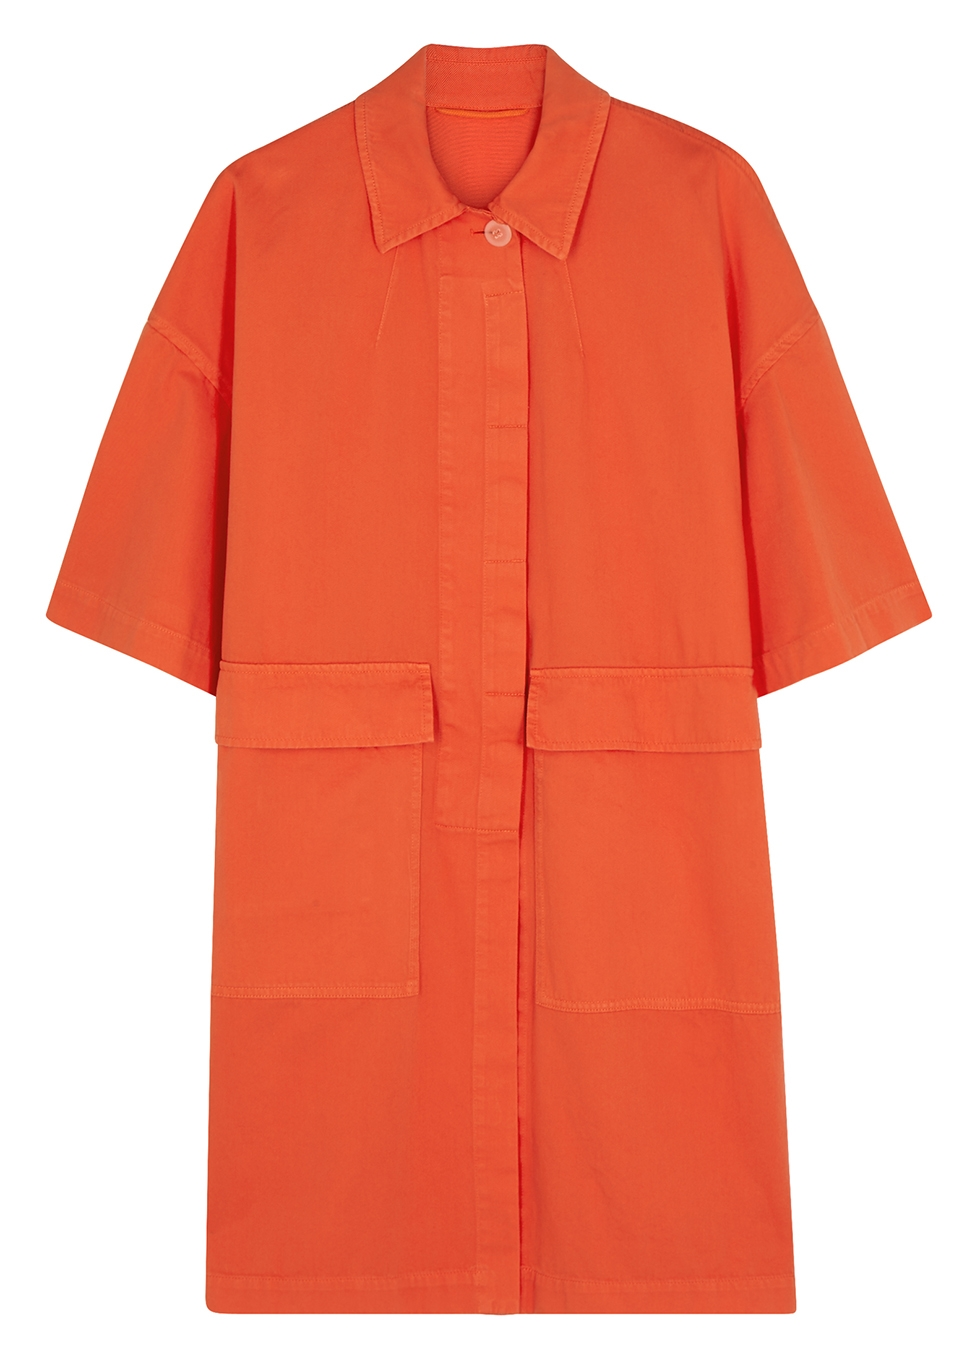 Rand orange cotton jacket - Dries Van Noten